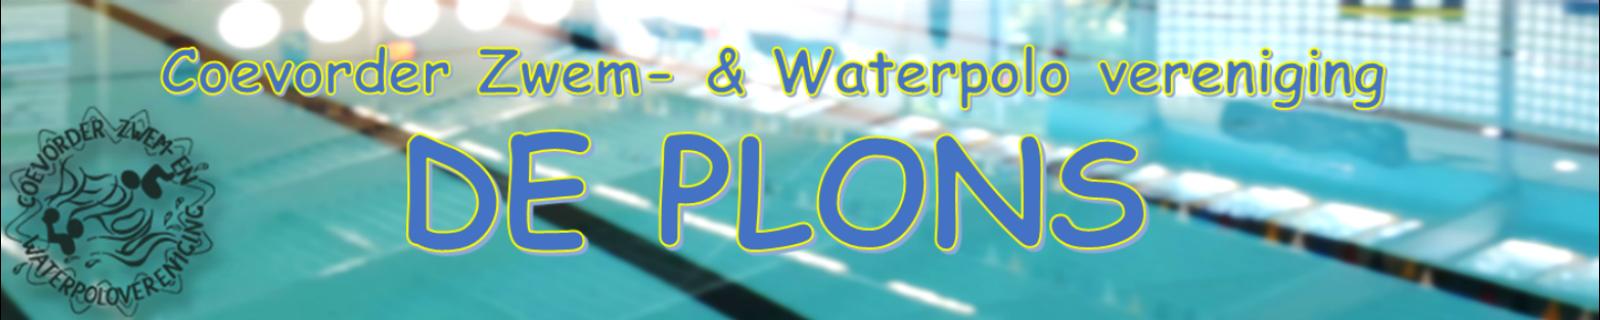 Zwem en Waterpolo vereniging De Plons Coevorden